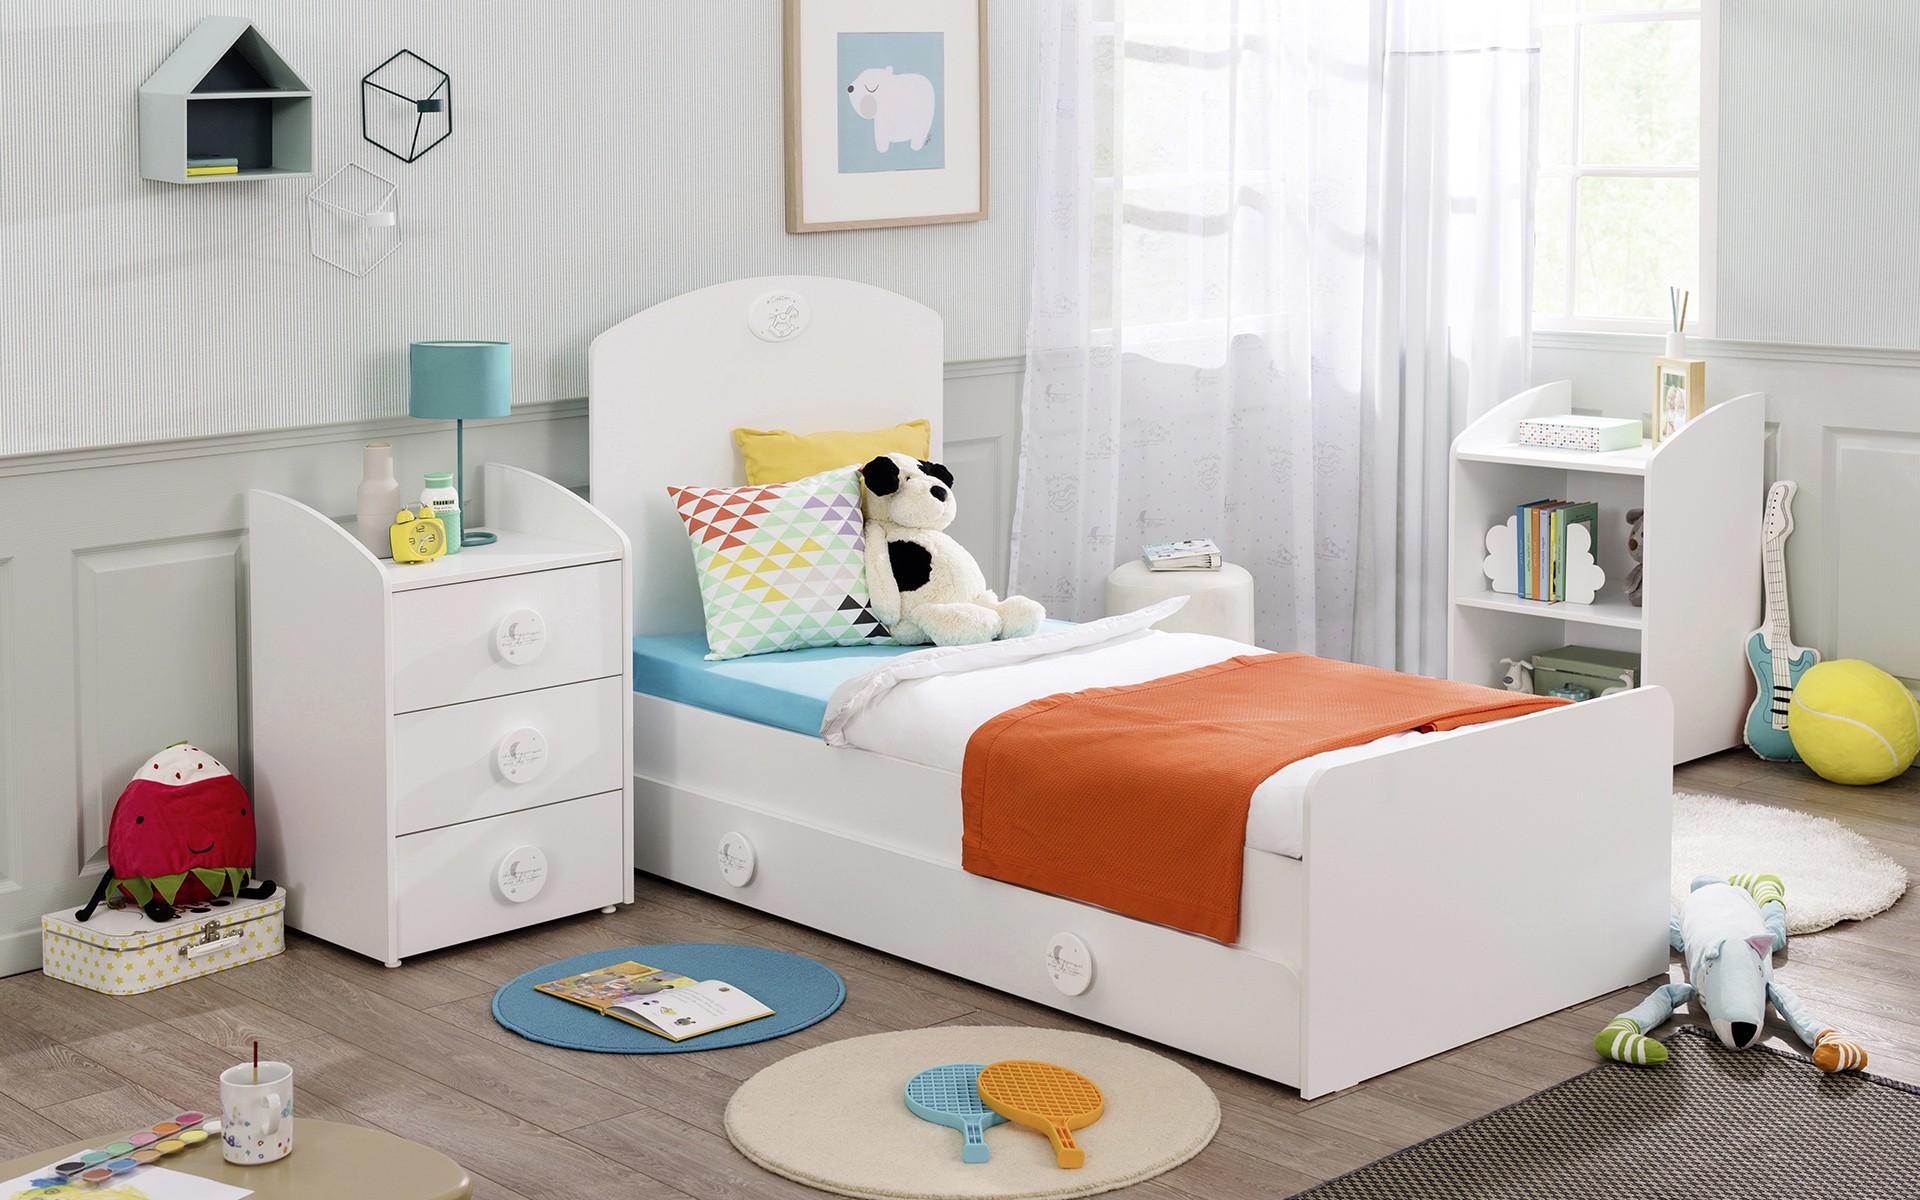 Gordijn Babykamer Babykamers : Sachsa gordijn licht babykamer specialist in kinderkamers en